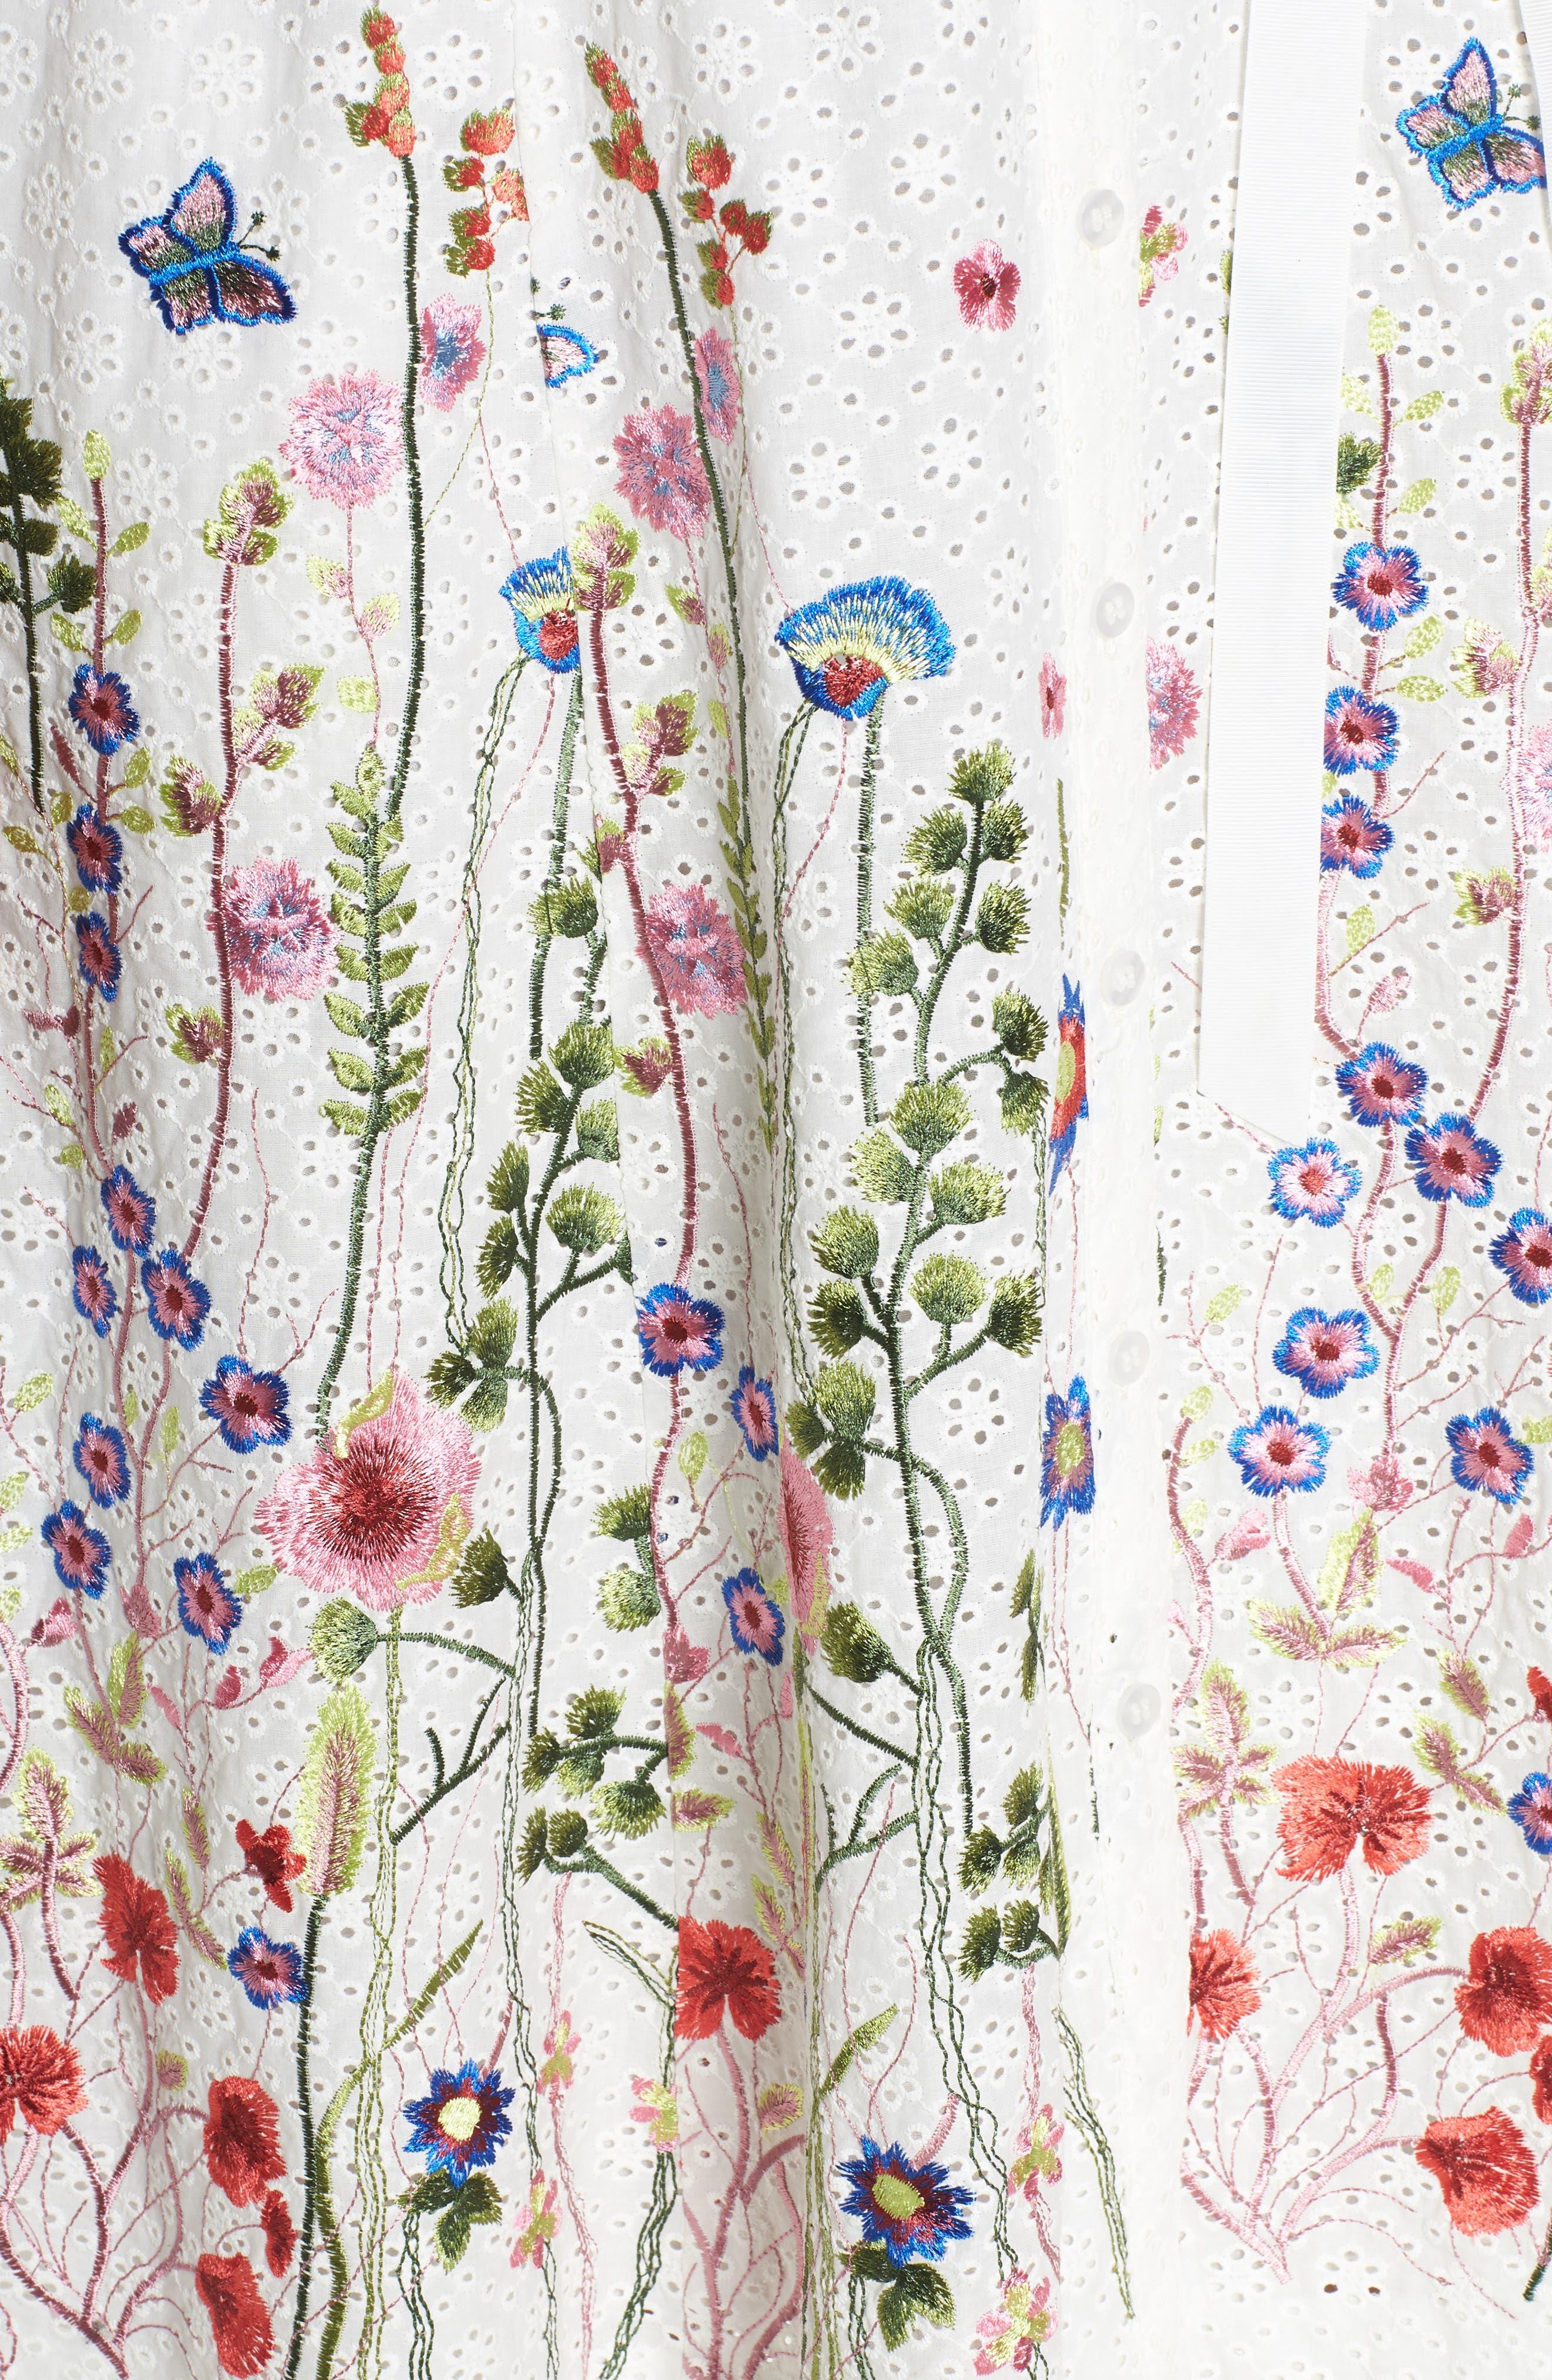 Floral Embroidered Eyelet Shirtdress,                             Alternate thumbnail 5, color,                             White/ Royal/ Green